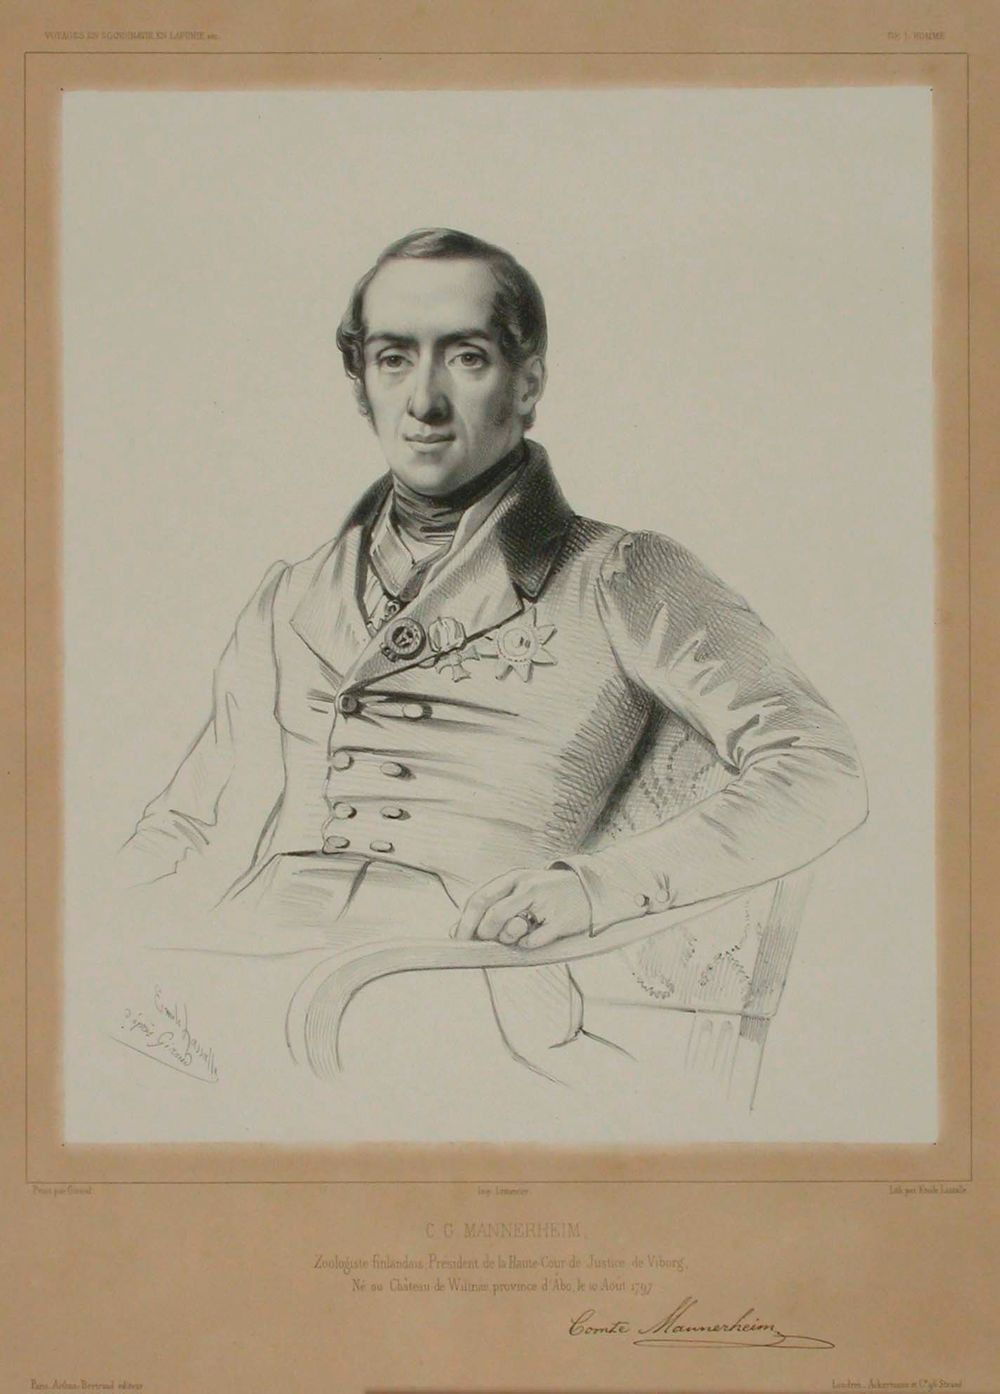 Kreivi C.G. Mannerheimin muotokuva, Pierre Francois Eugene Giraudin mukaan